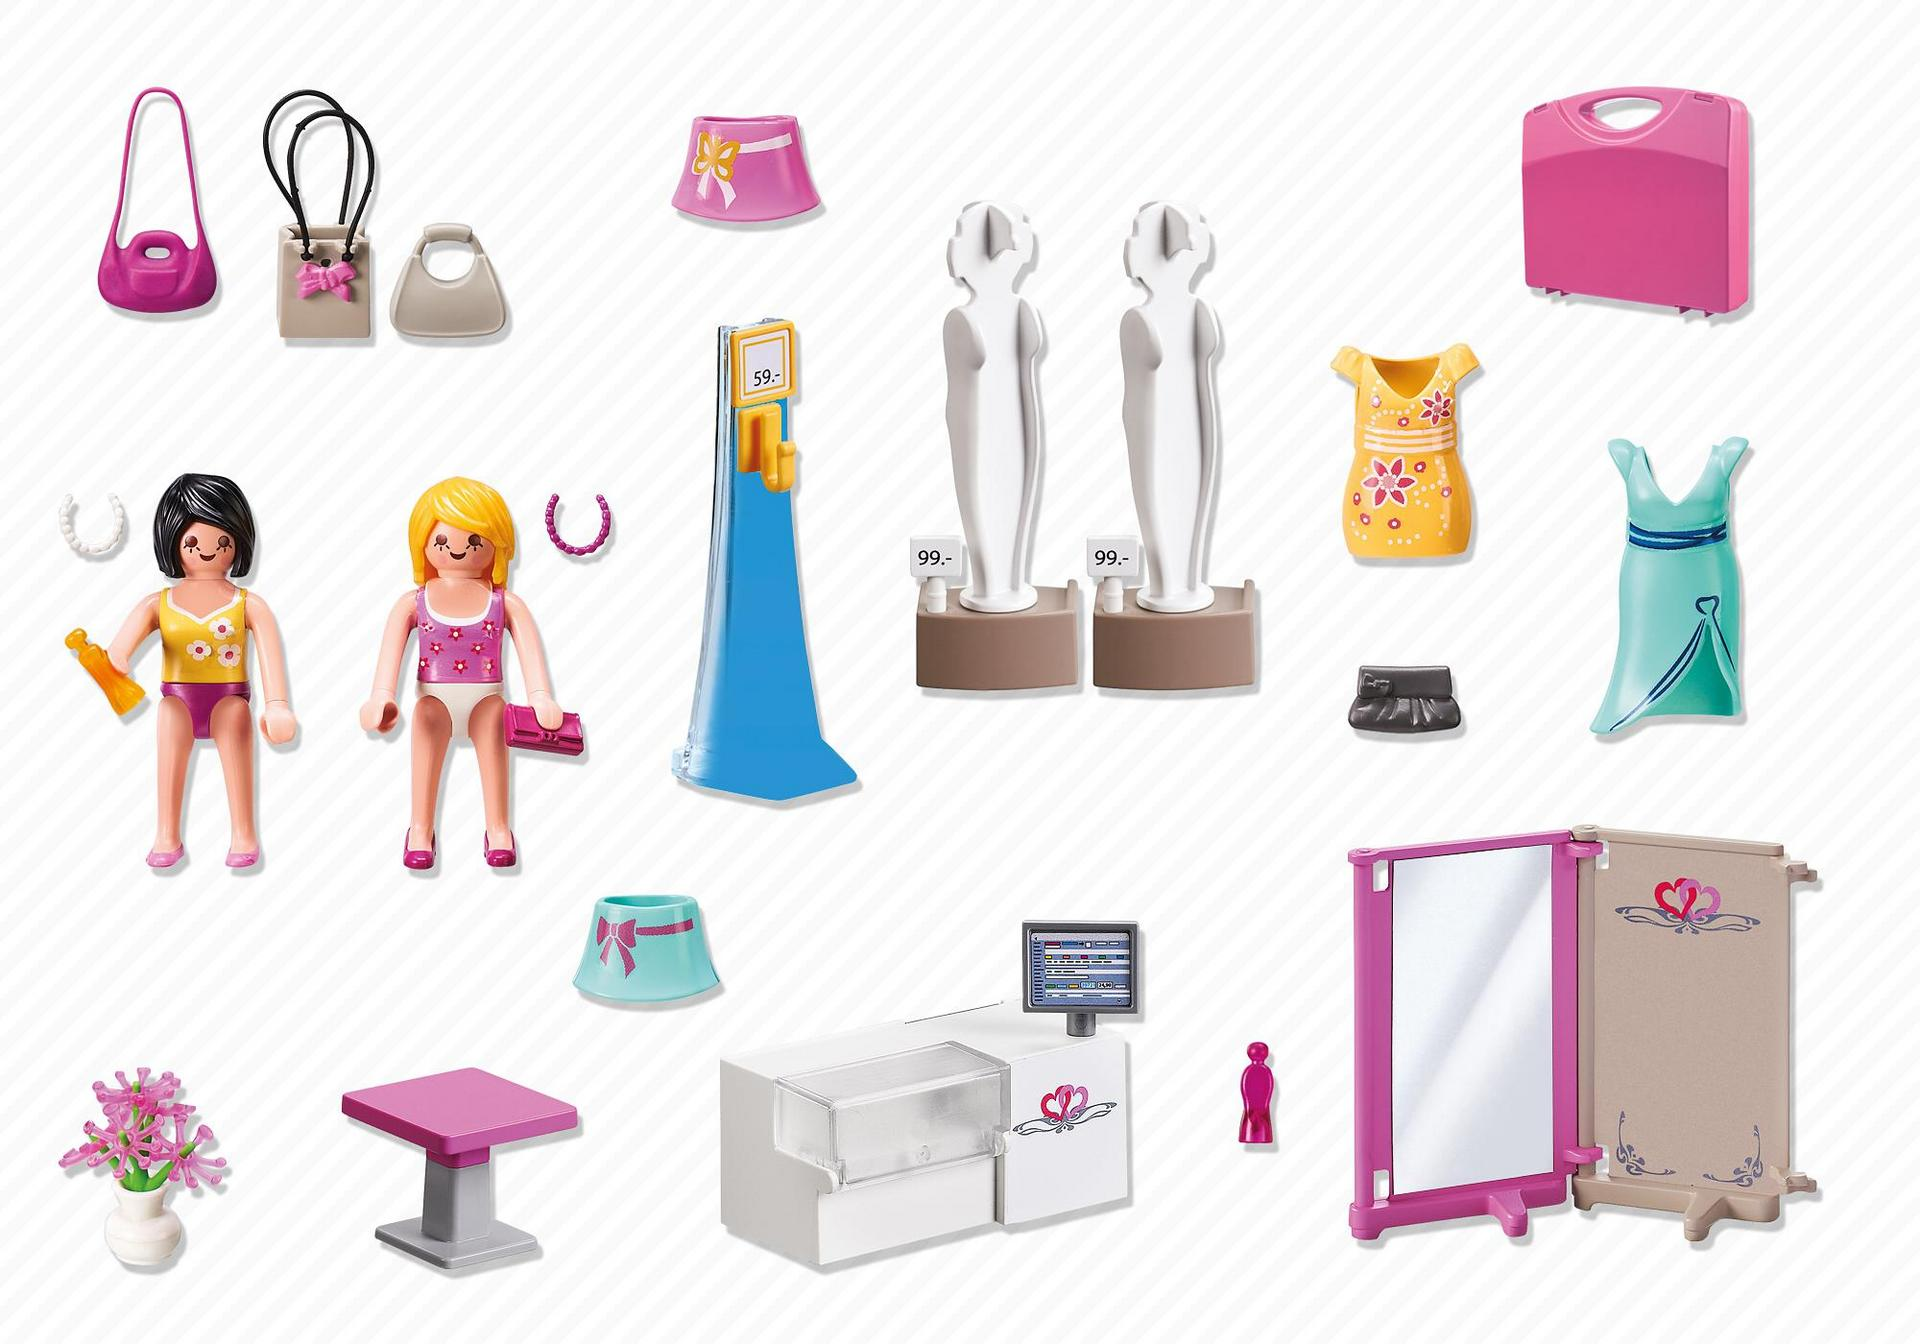 valisette shopping 5611 playmobil france. Black Bedroom Furniture Sets. Home Design Ideas